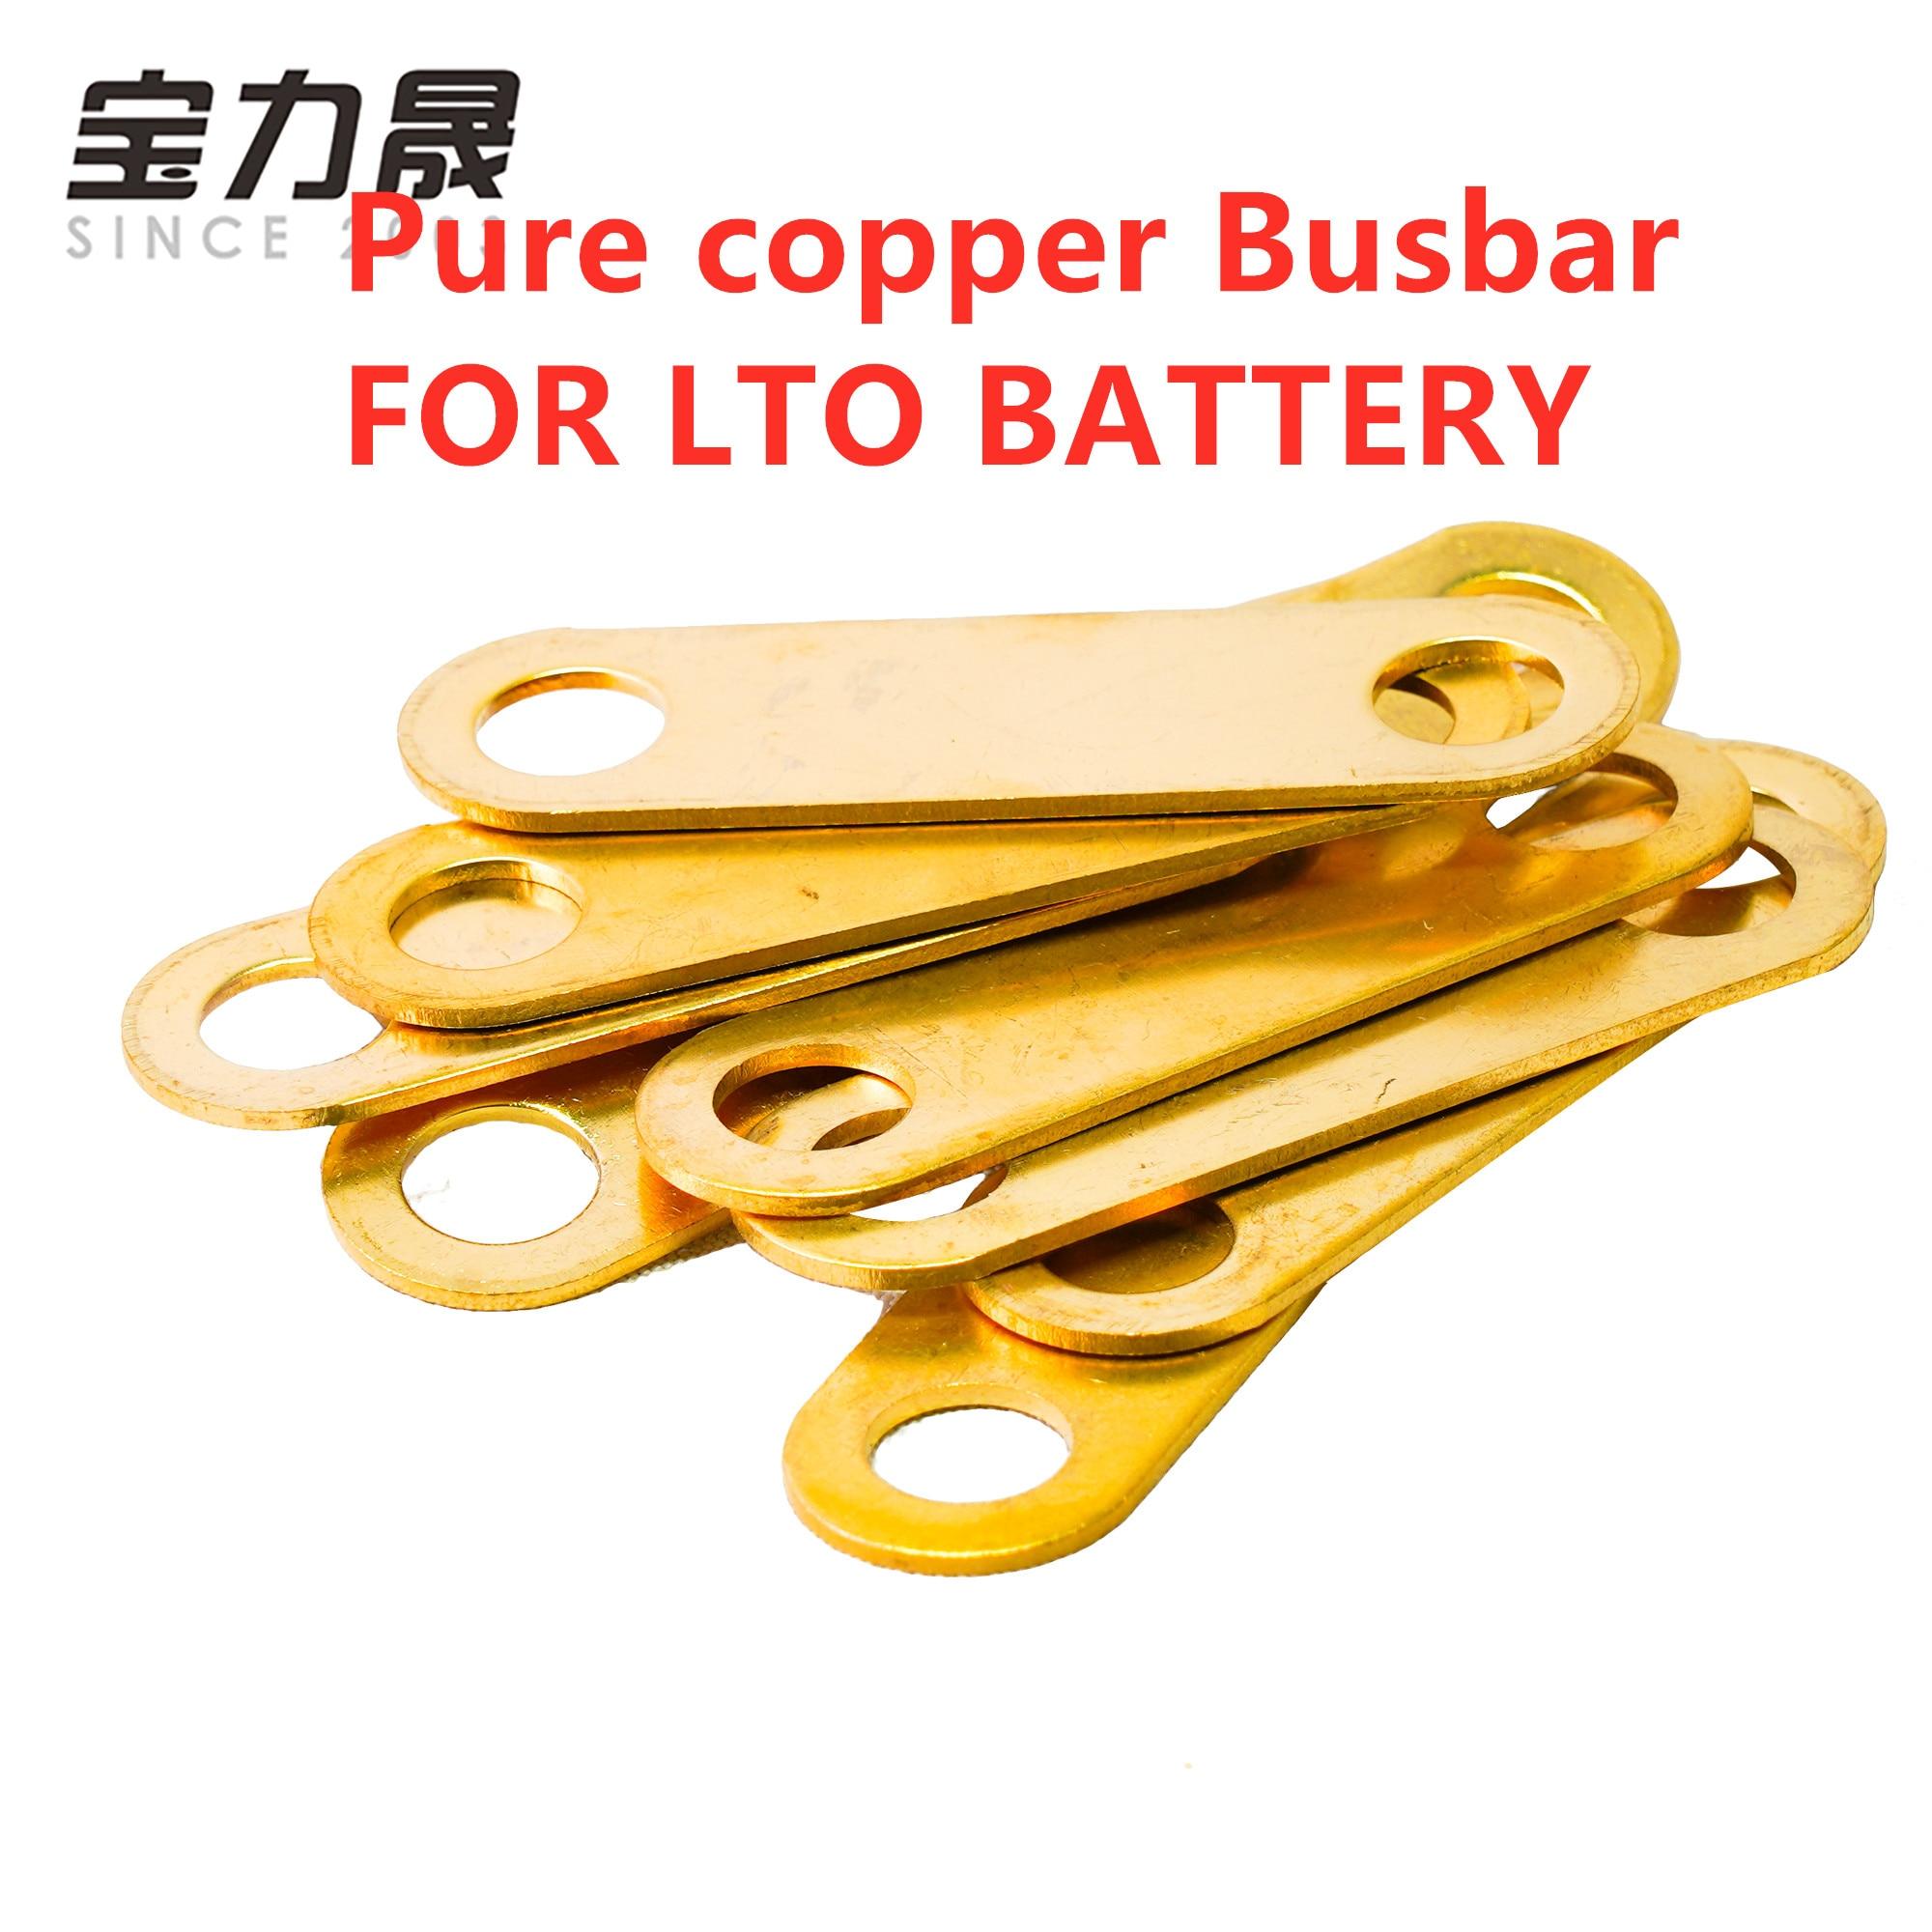 BusBars For LTO Battery Yinlong 66160 2.3V 2.4V 30AH 35AH 40AH 45AH Lithium Titanate LTO Cell Pure Copper  Nickel Plating